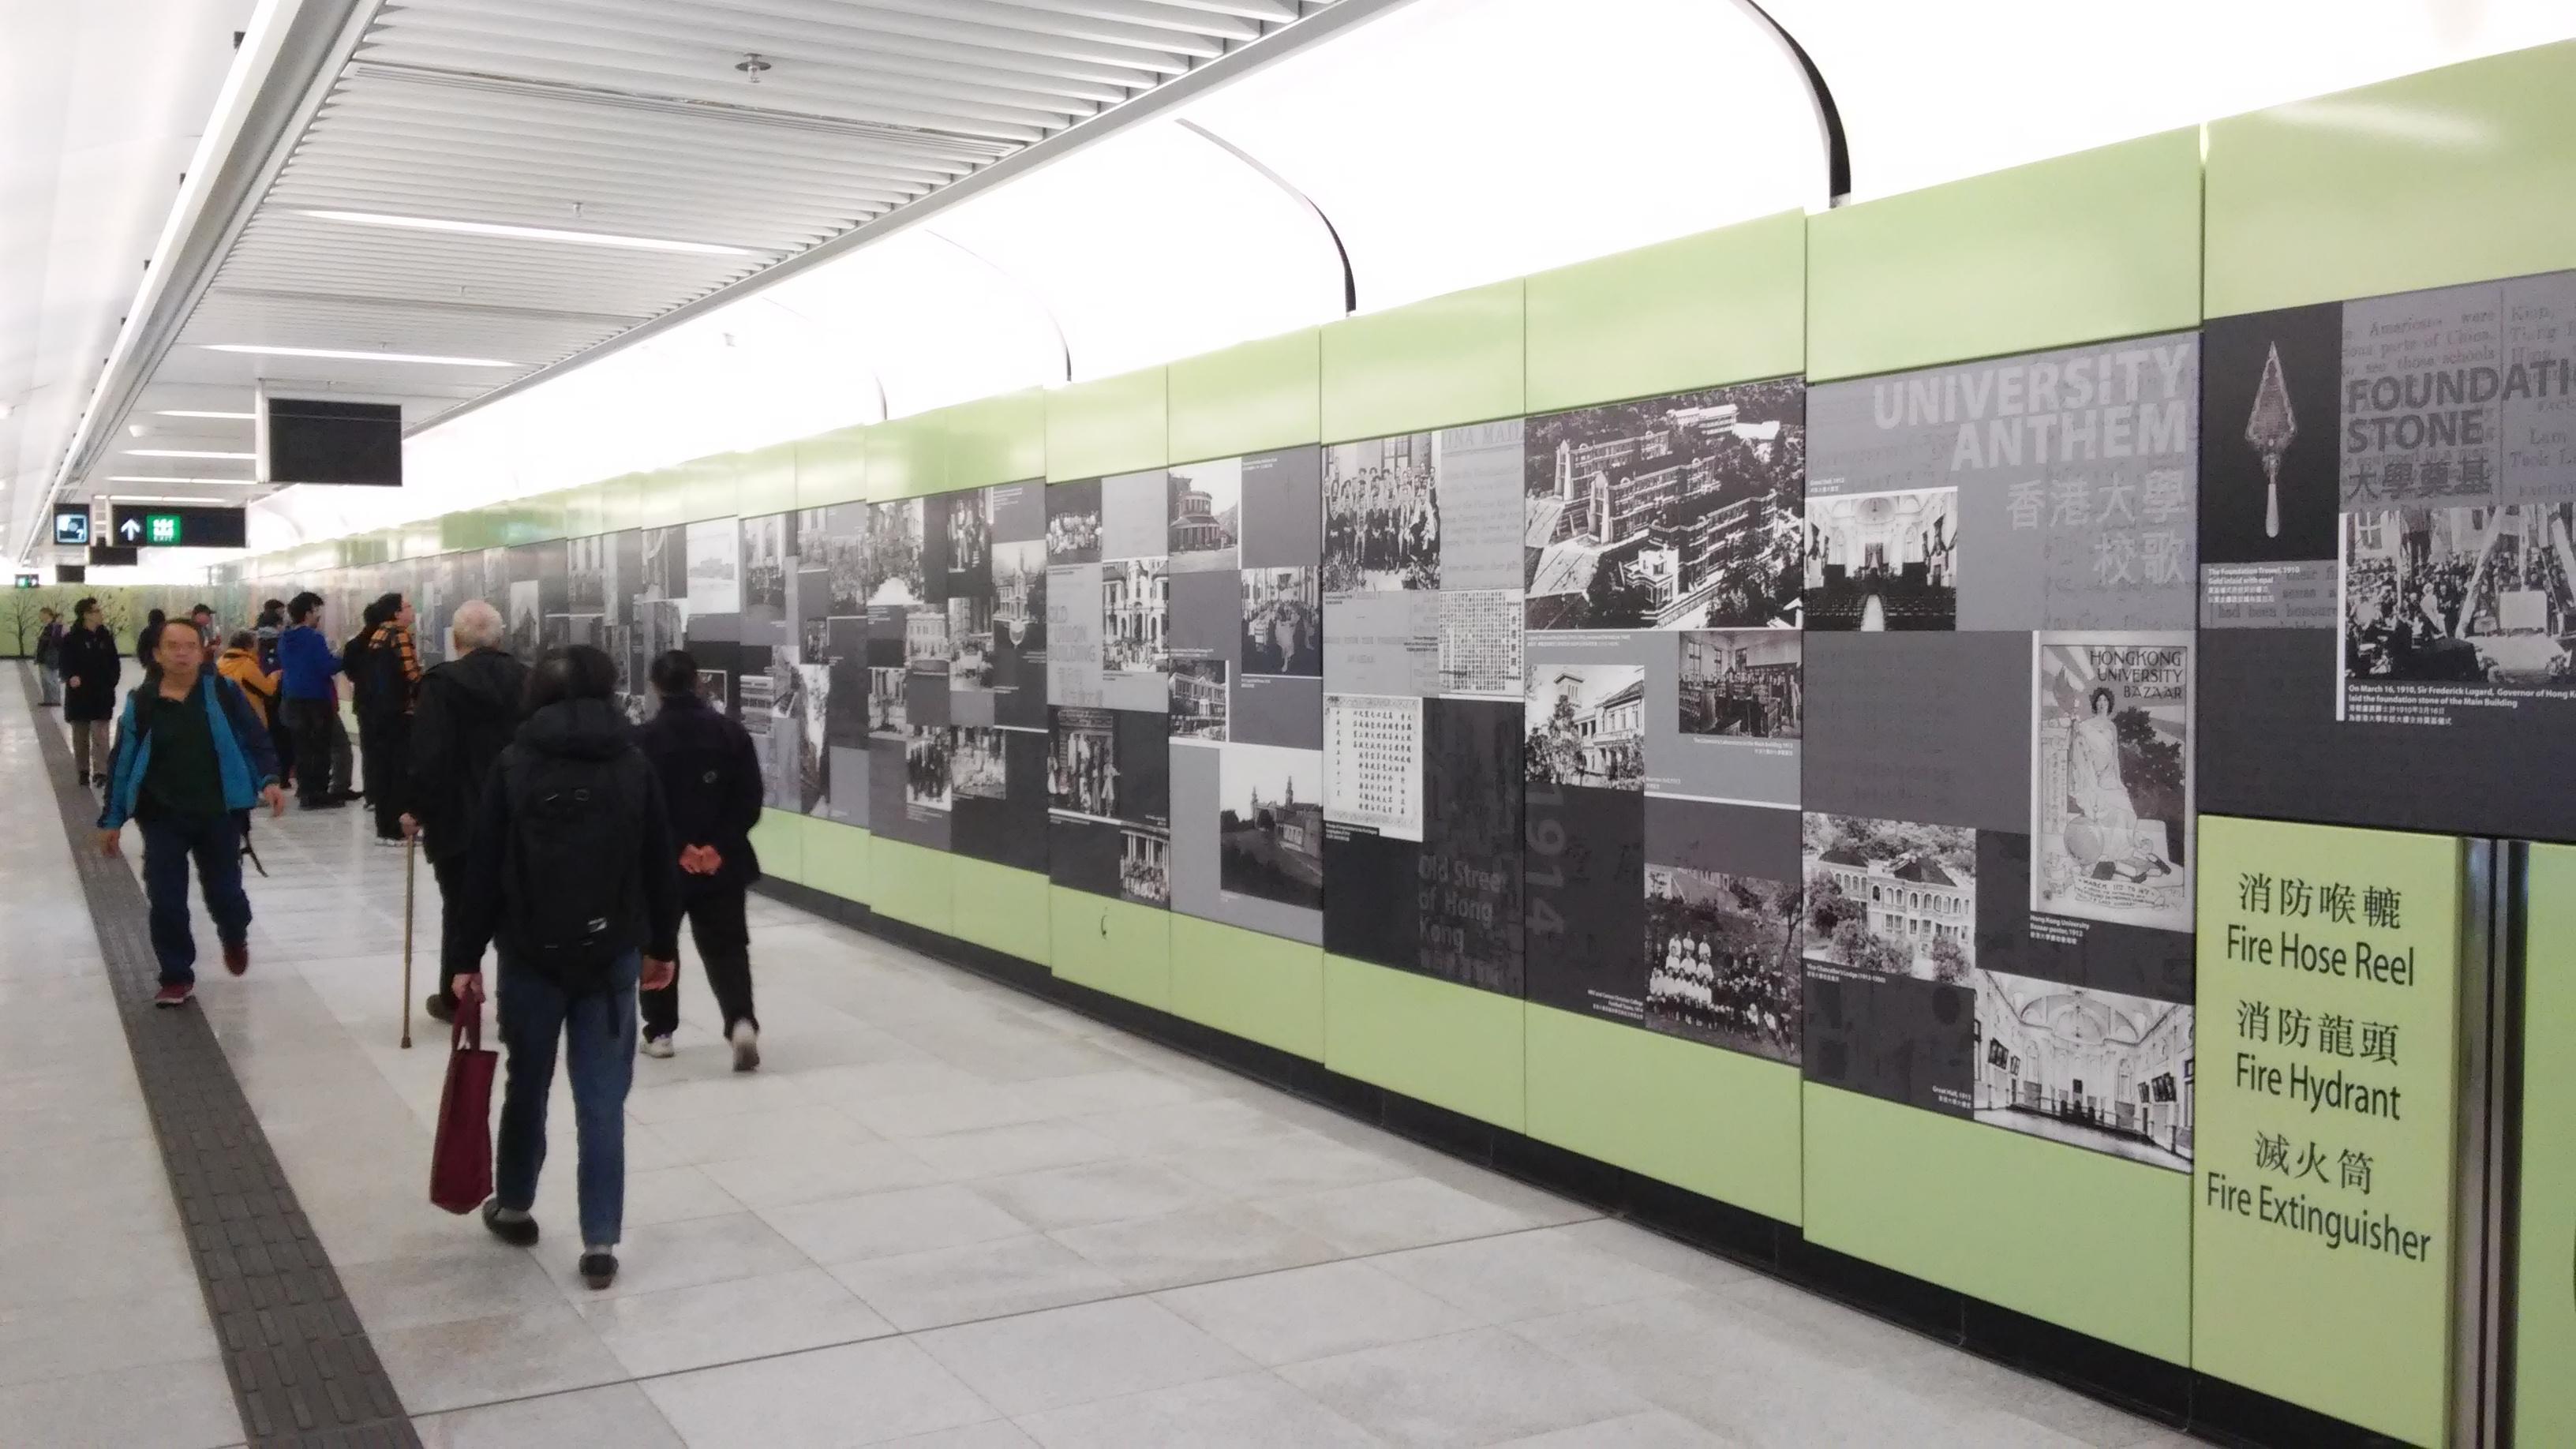 D Exhibition Hk : File hk sai wan hku mtr station centennial wall art and